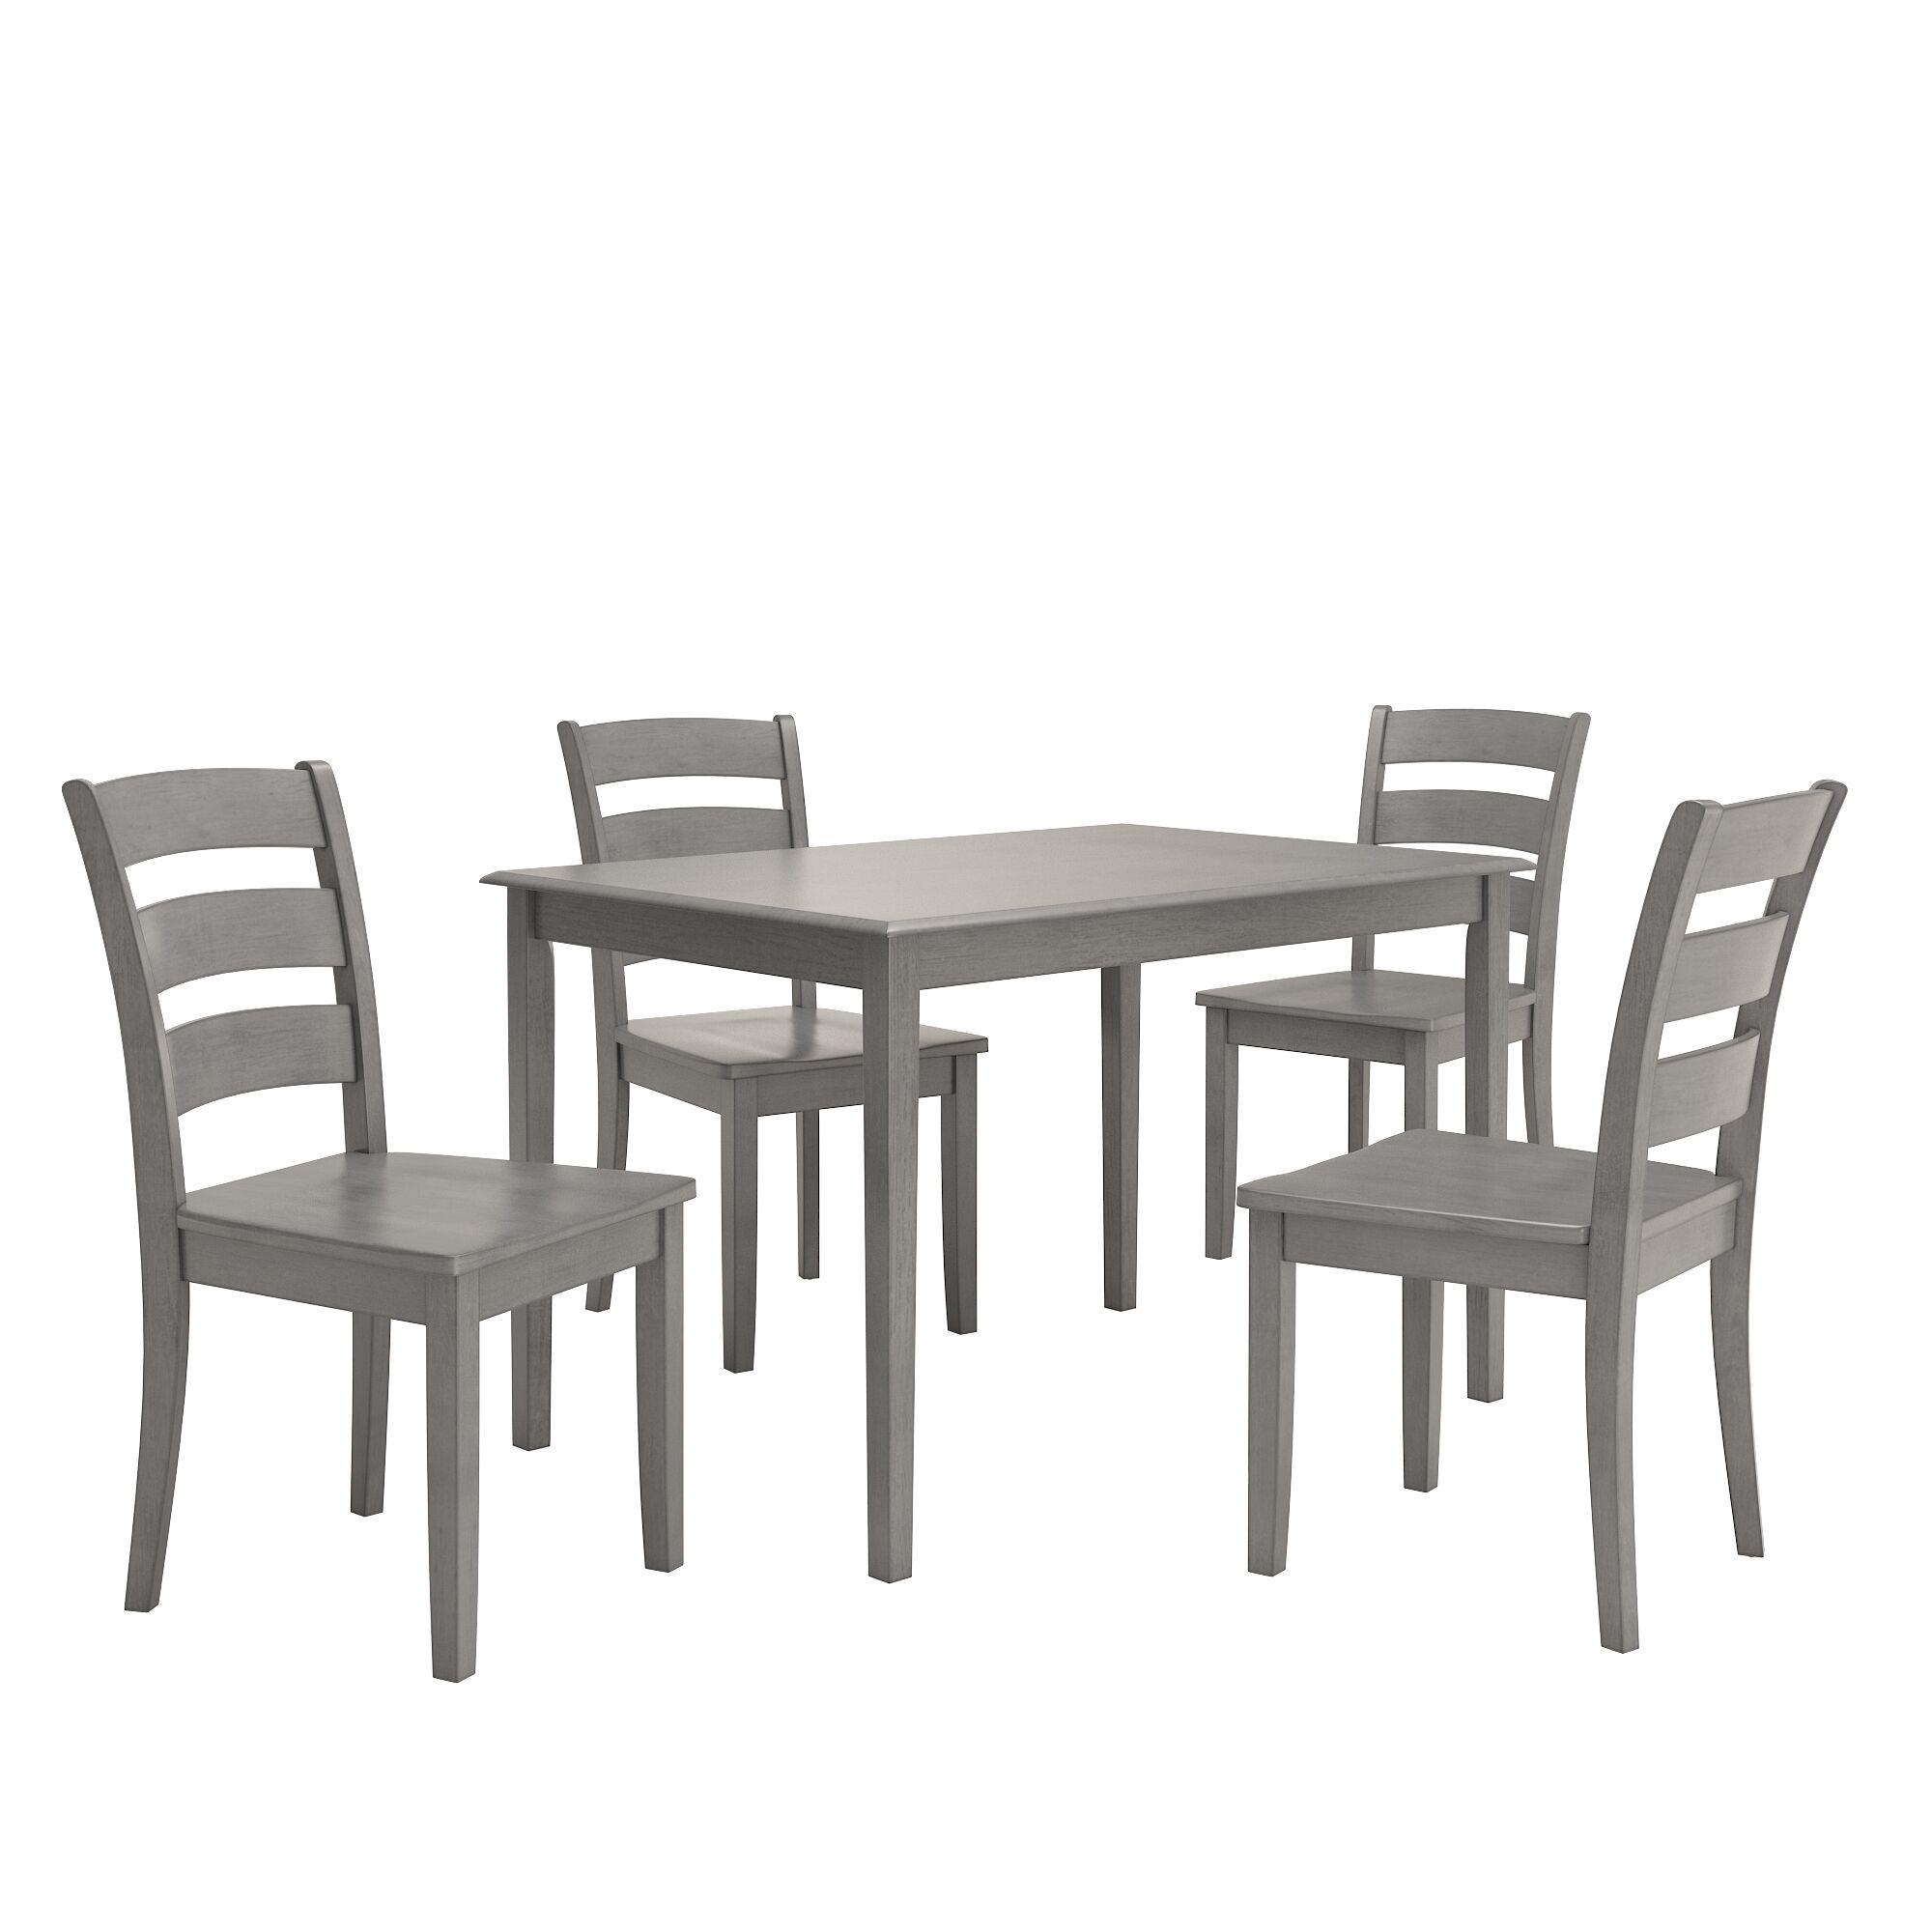 Alverson 5 Piece Dining Set Color: Antique Gray